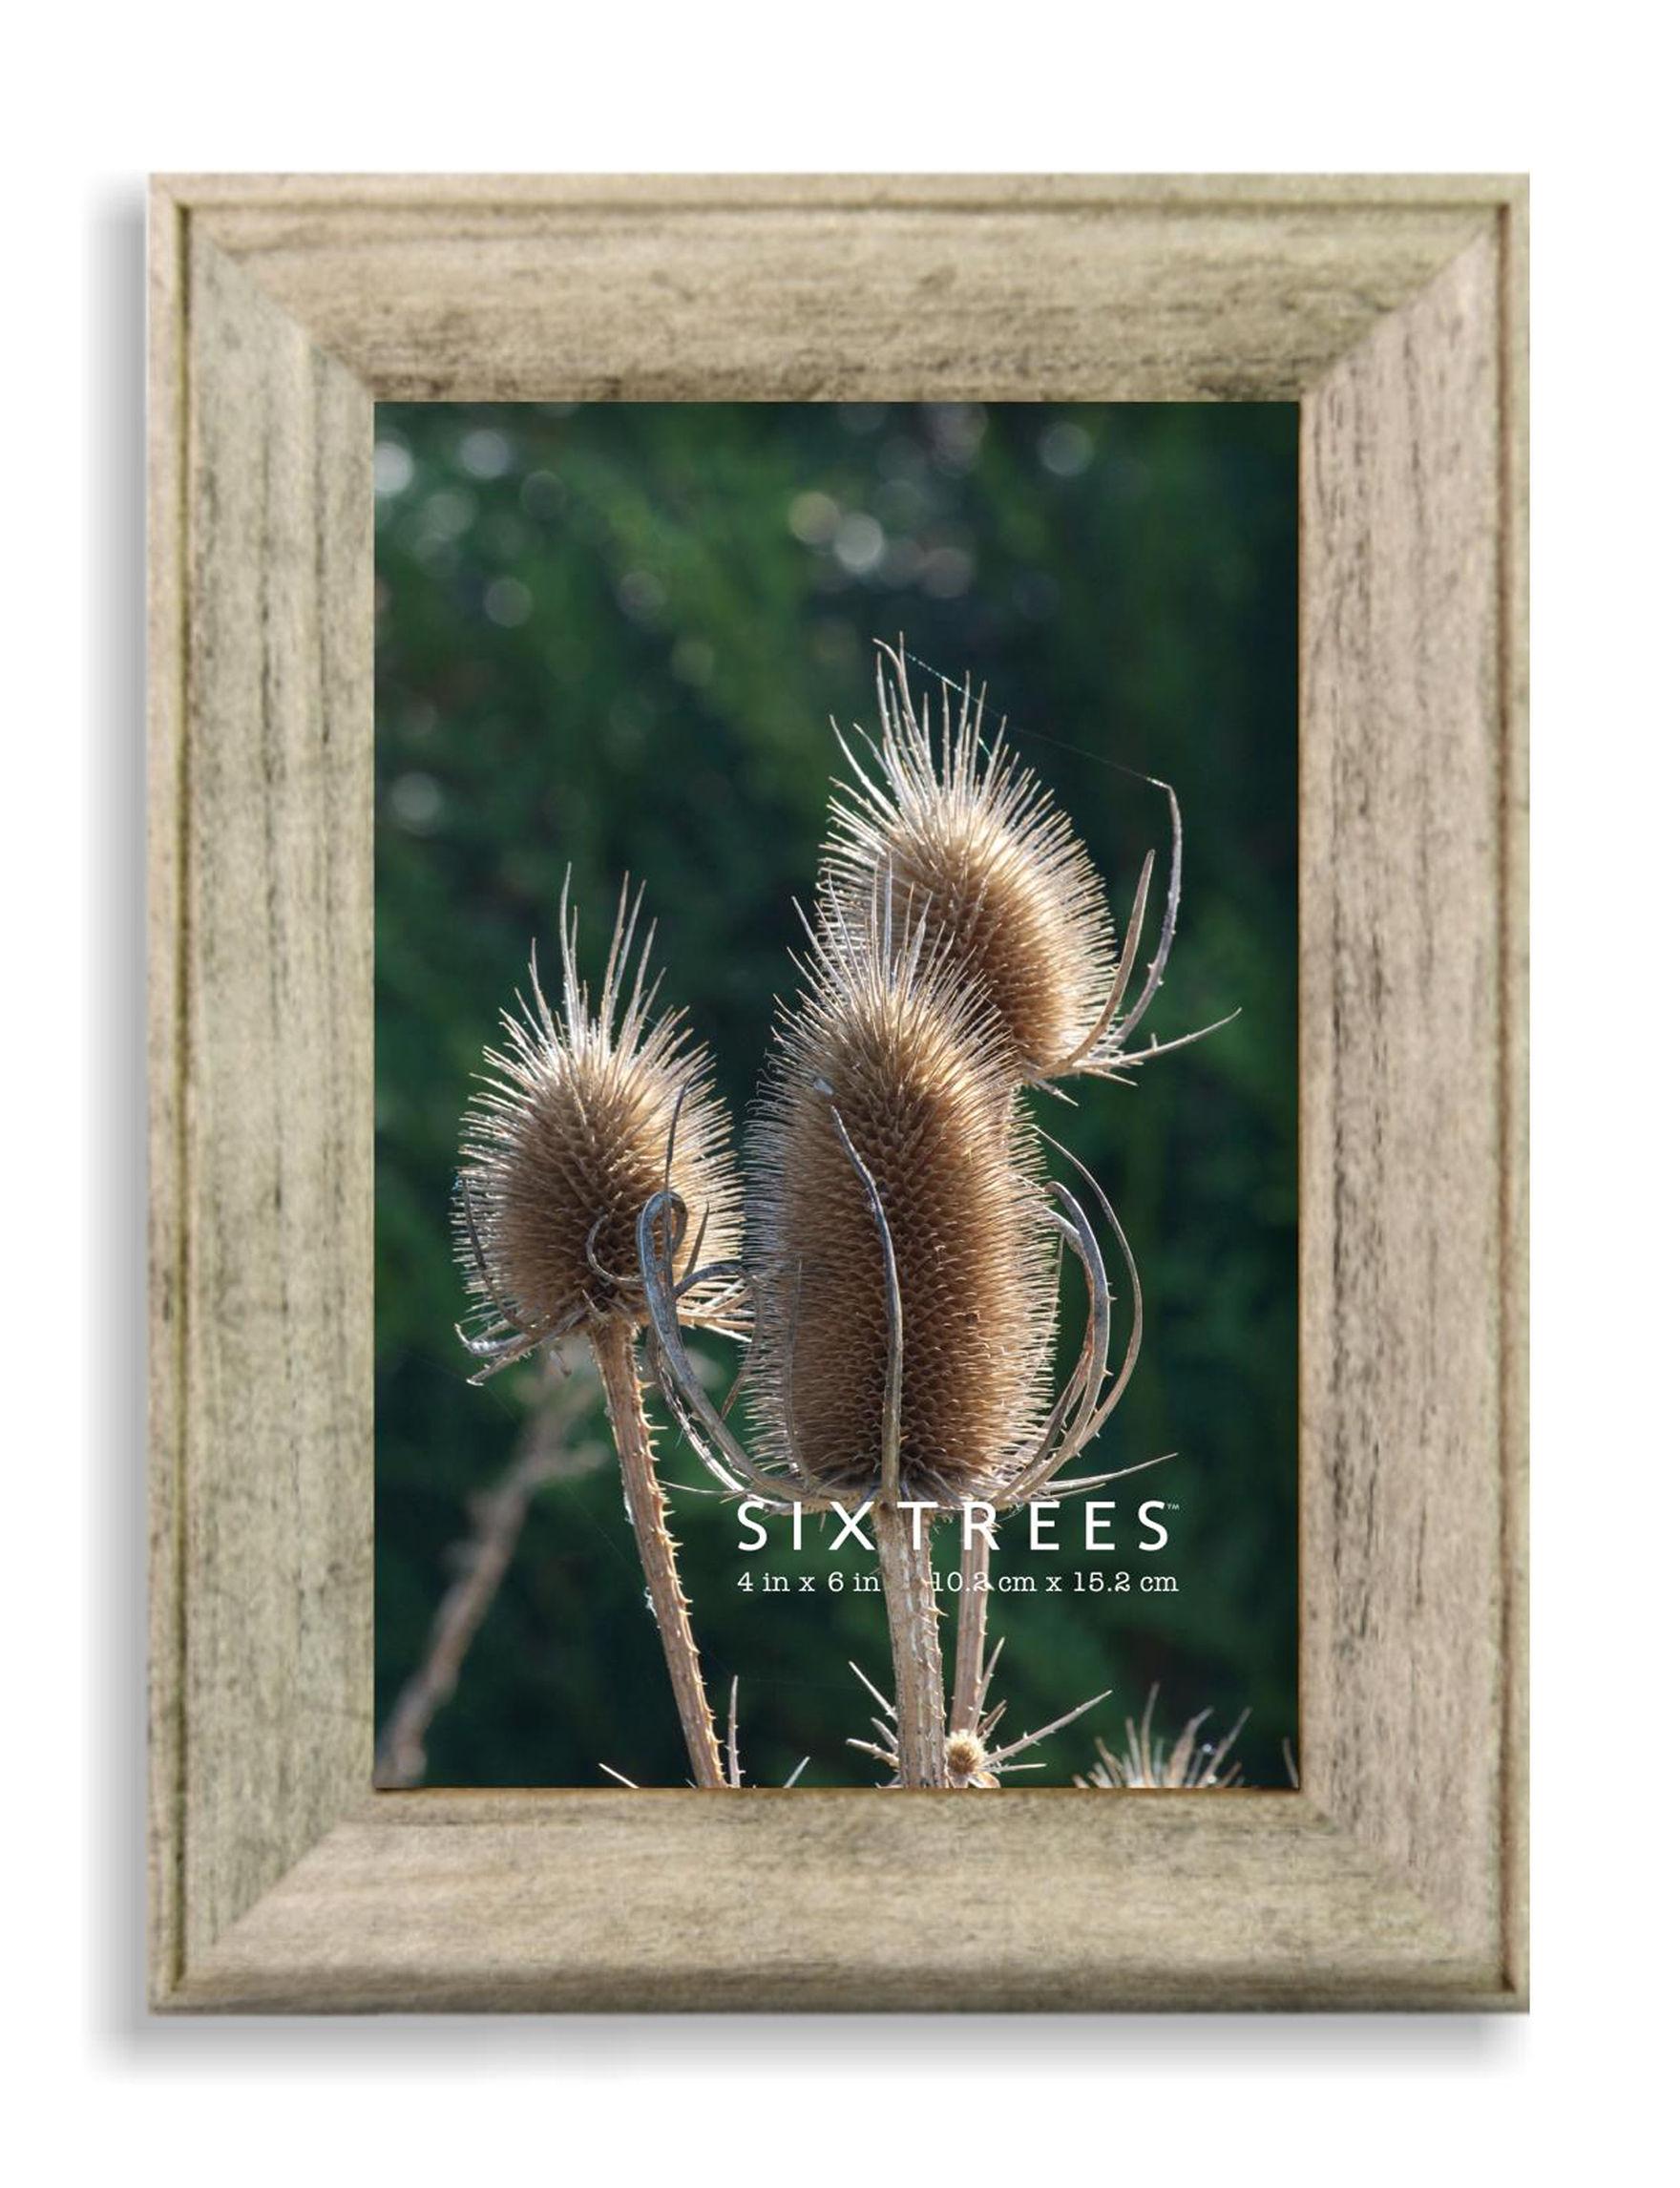 Sixtrees Grey Frames & Shadow Boxes